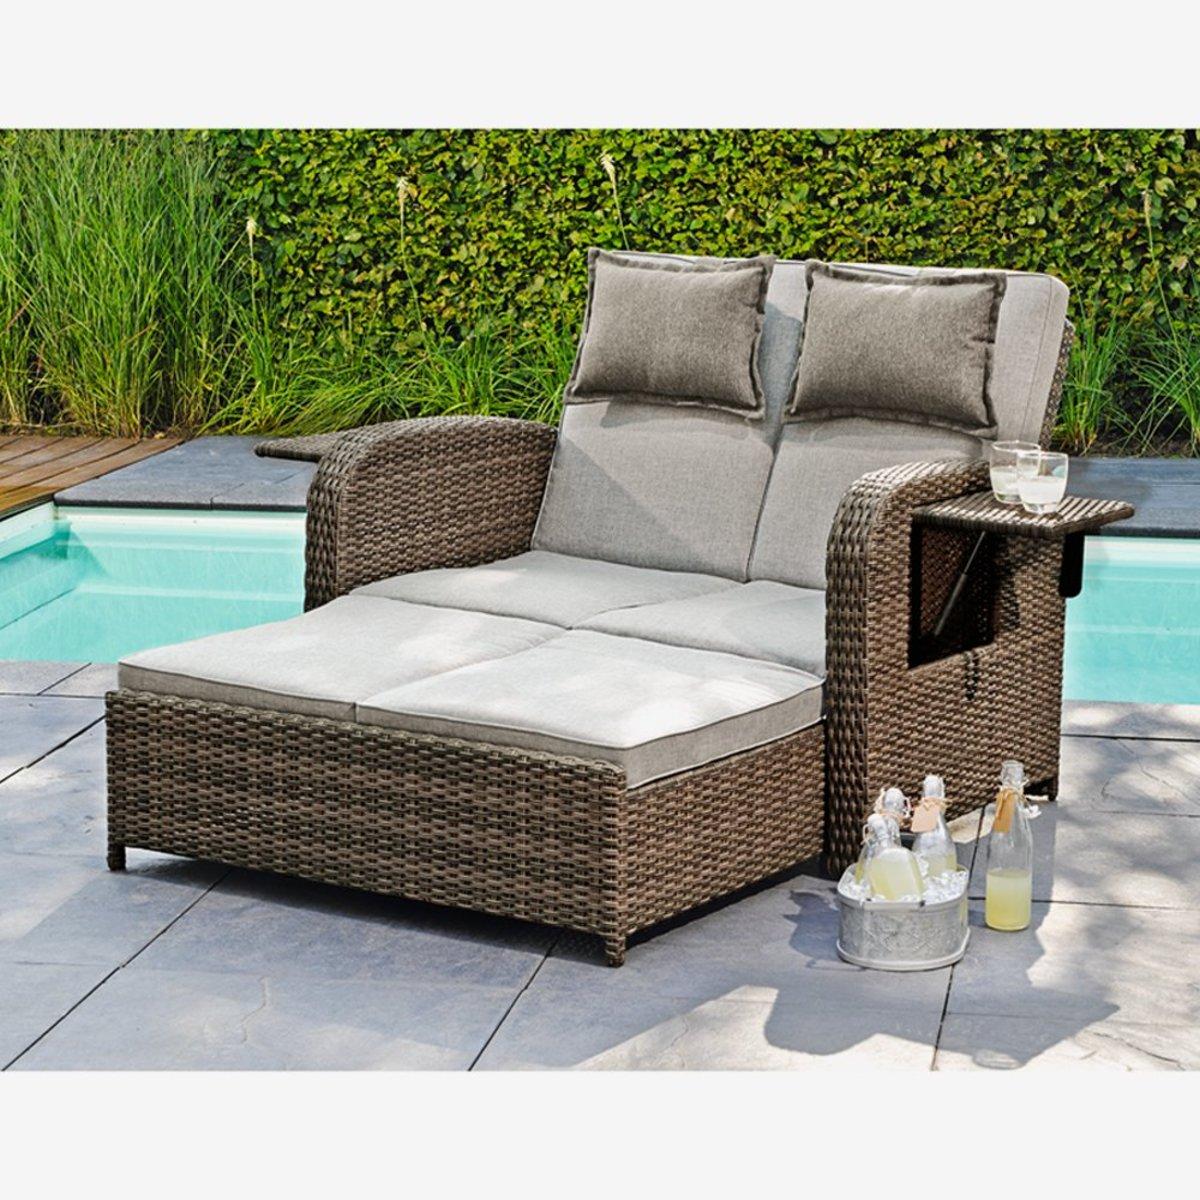 "Bild 3 von Multifunktions-Sofa ""Trinidad"" 117 x 90 x 90 cm"